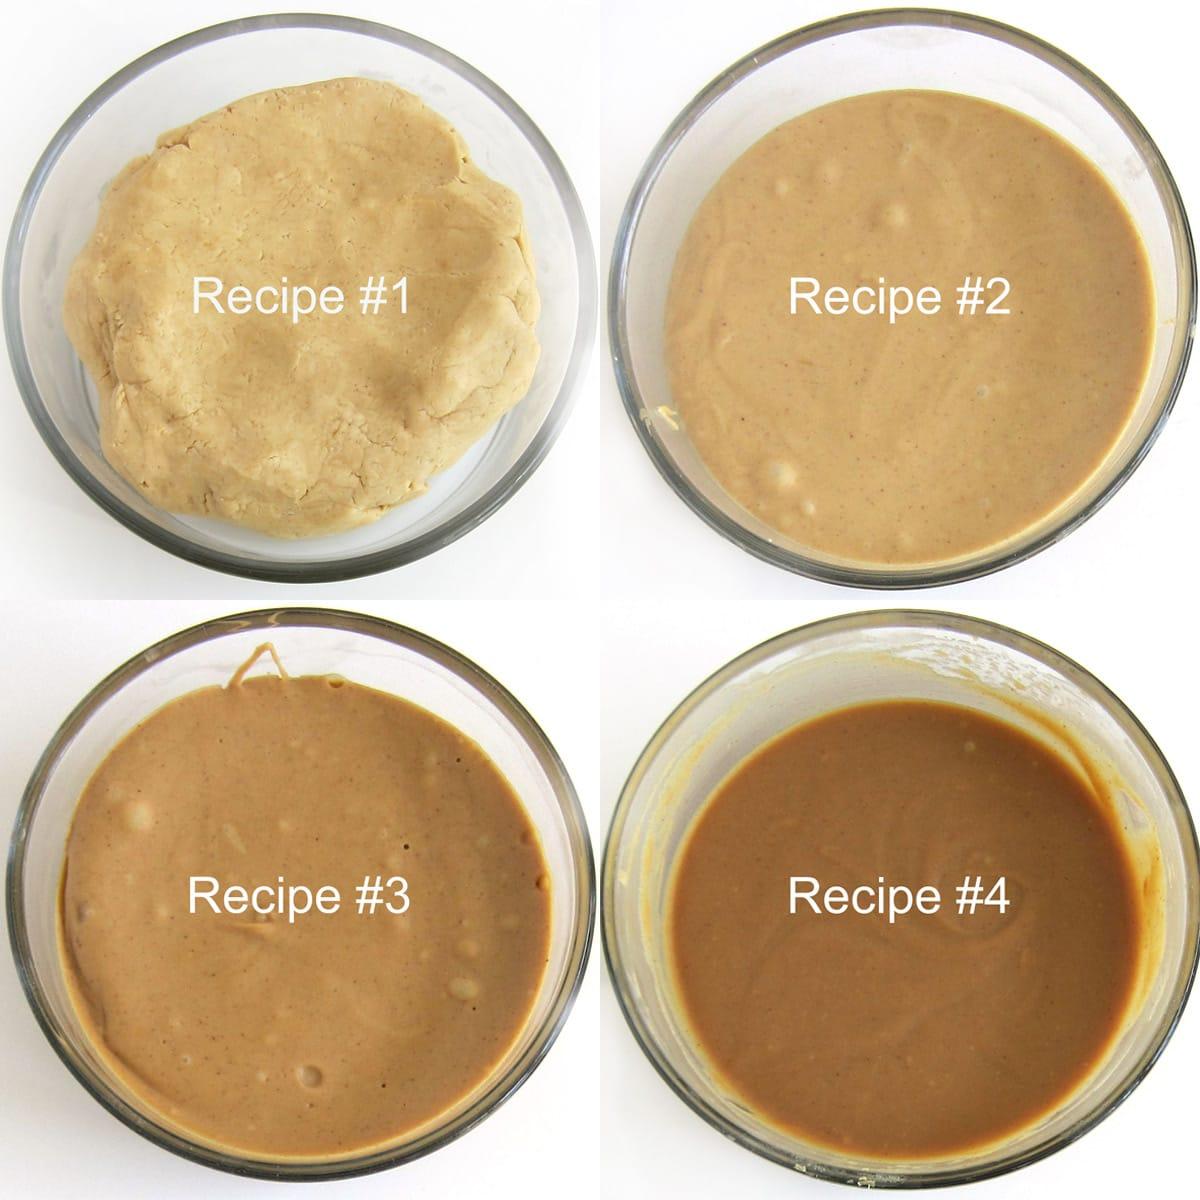 Four different peanut butter fudge recipes taste tested for our best peanut butter fudge recipes.